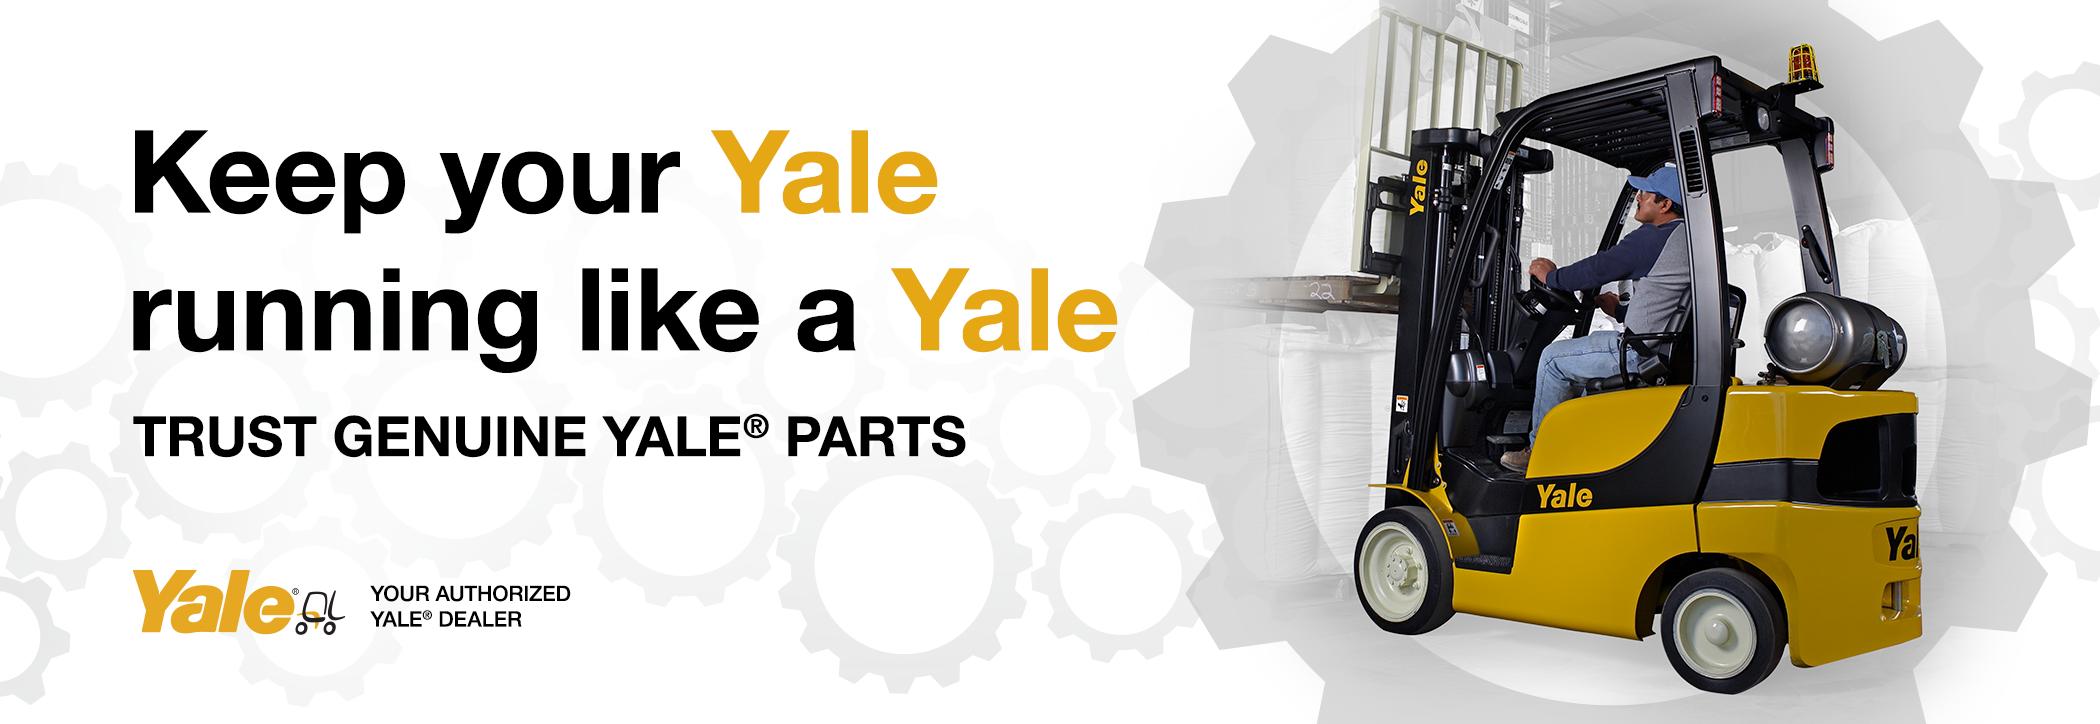 yale-parts-hero-panel-light